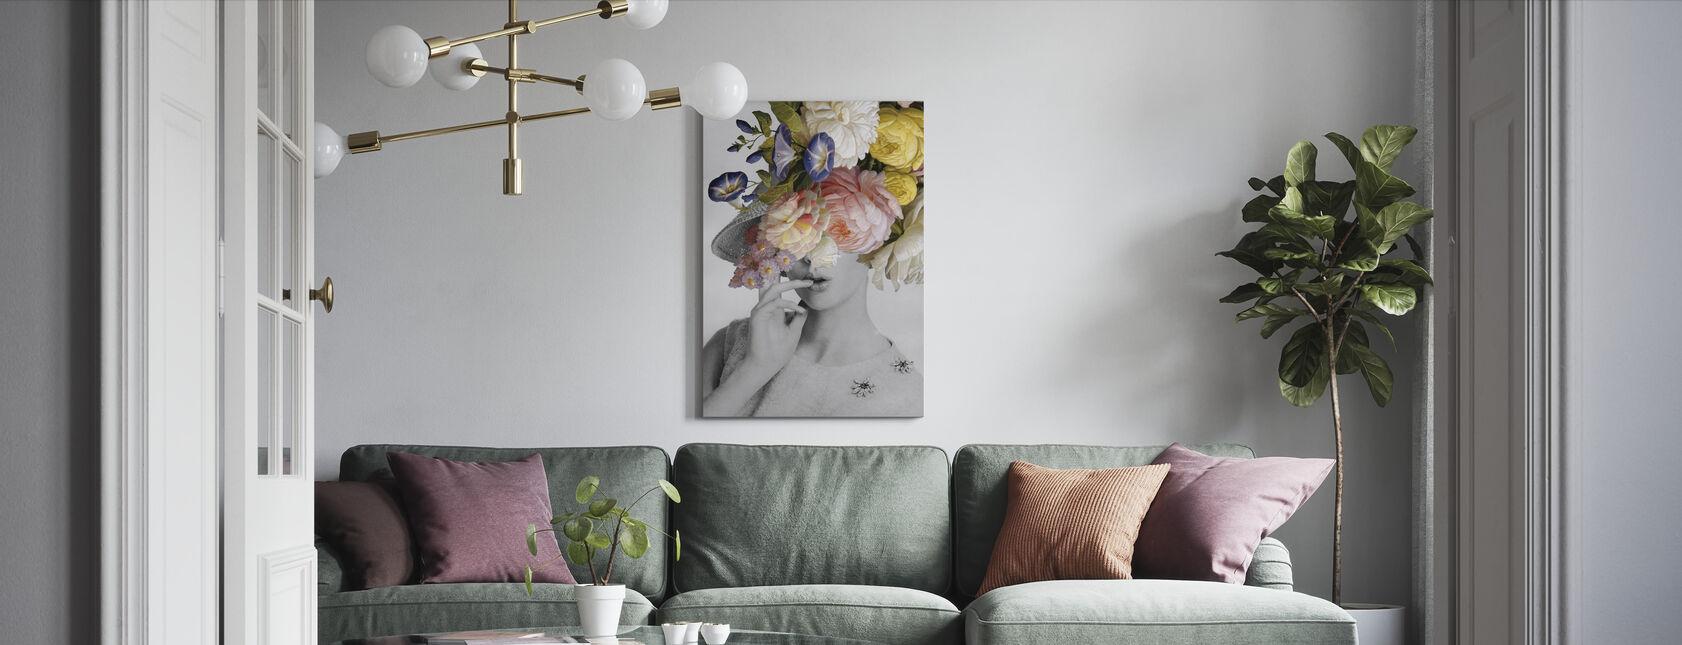 Garden Party I - Canvas print - Living Room